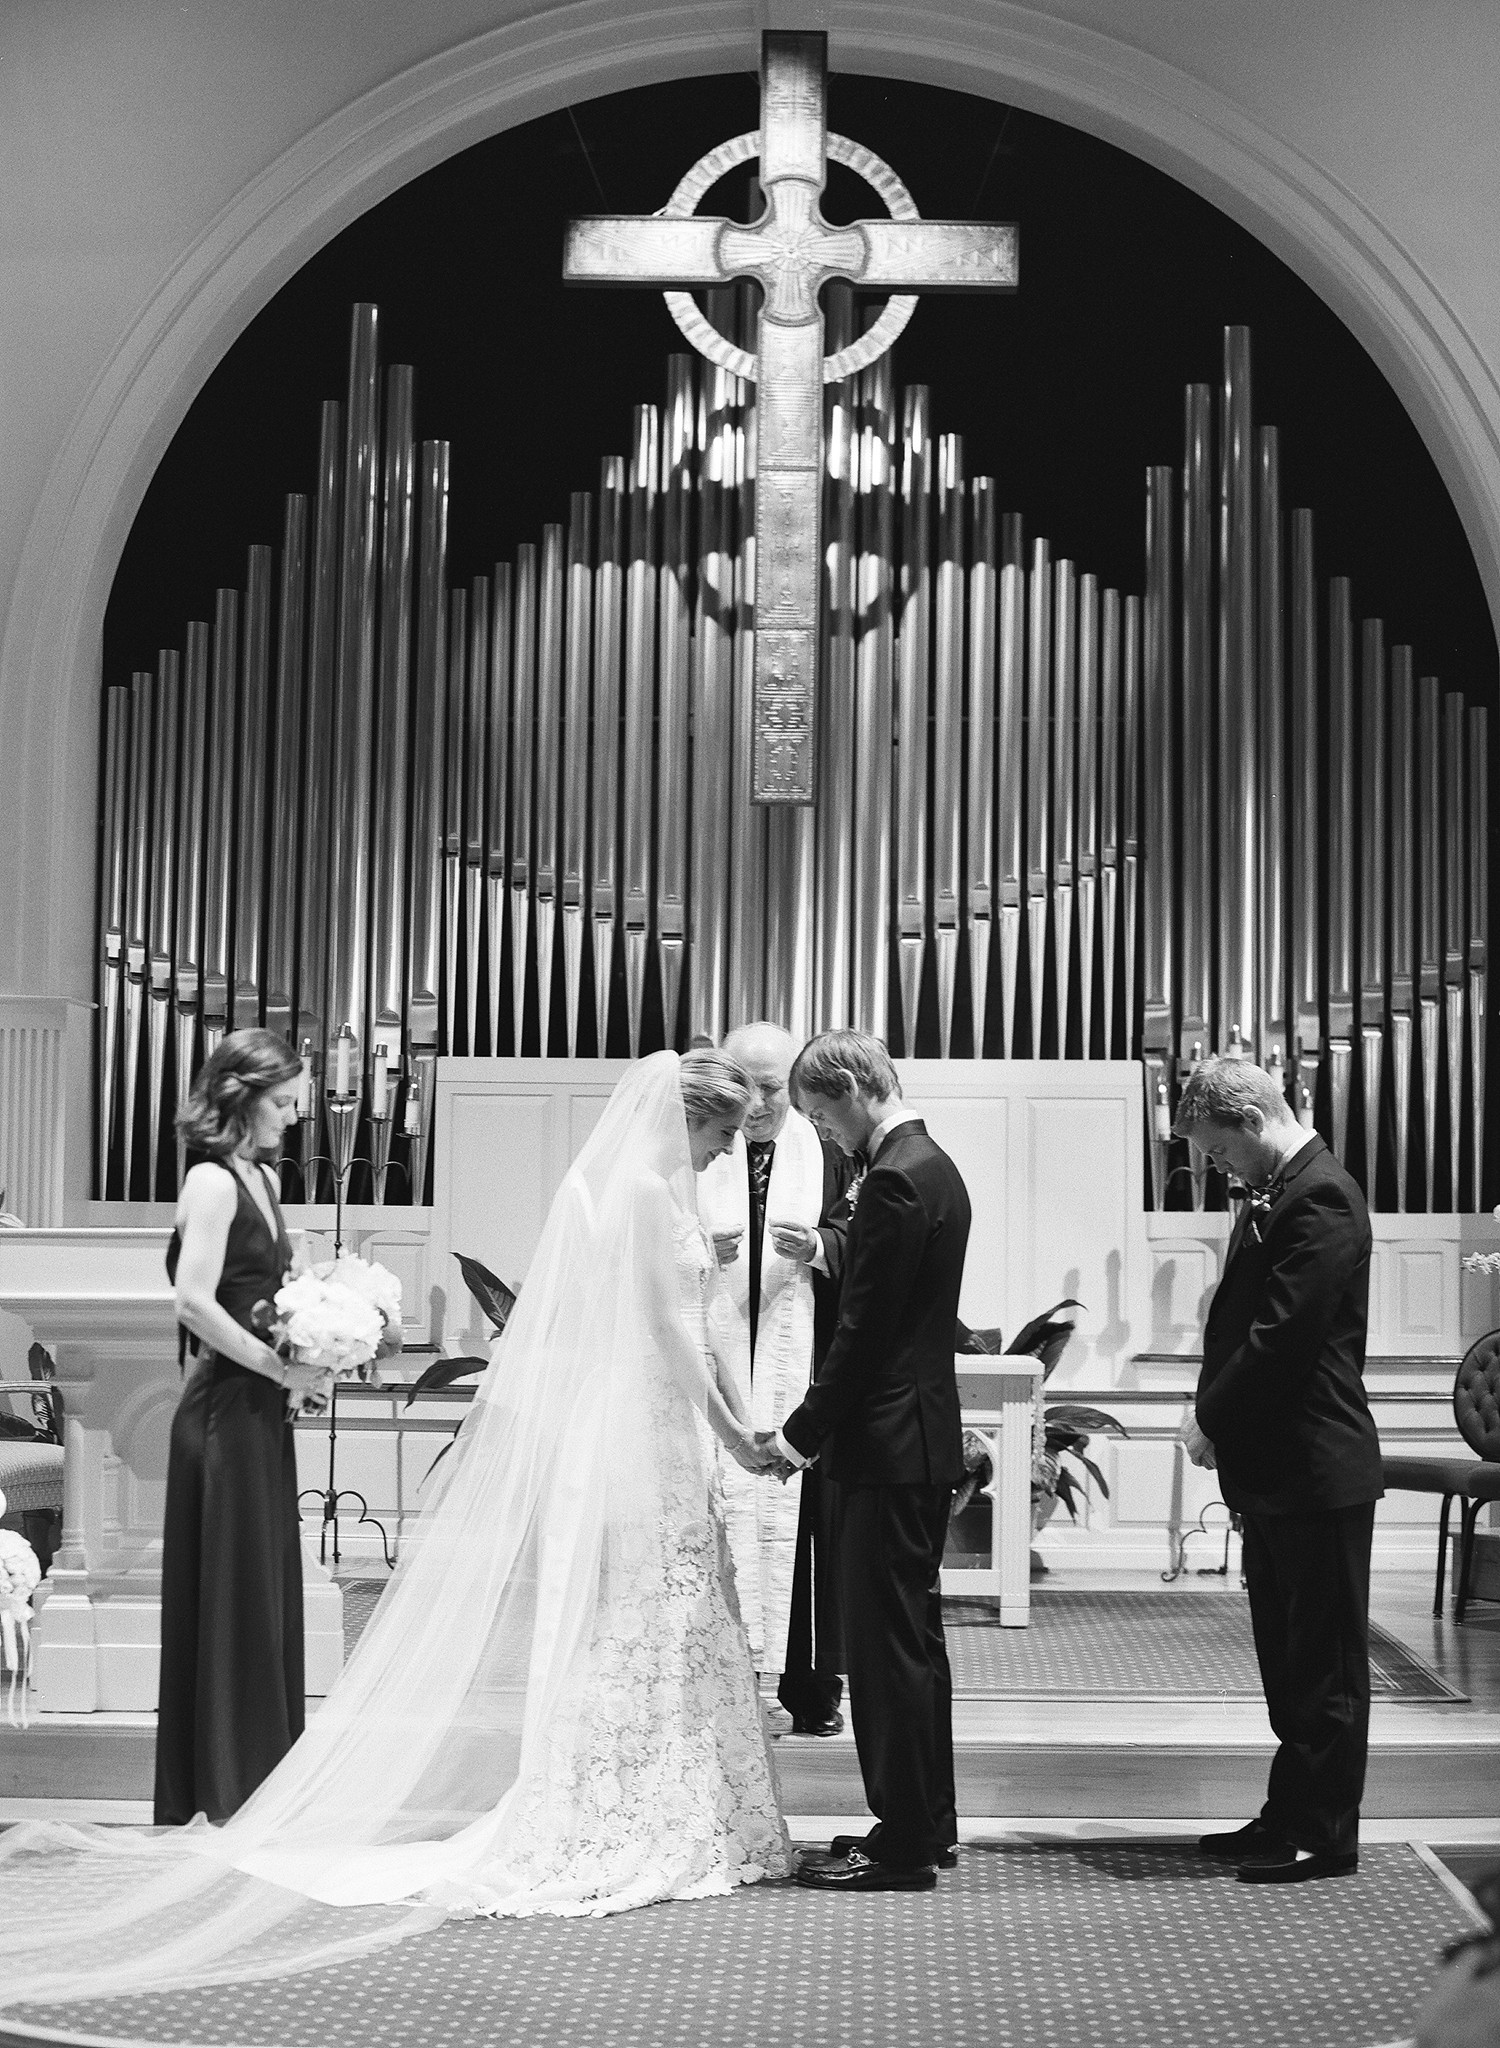 chelsea conor wedding ceremony in church